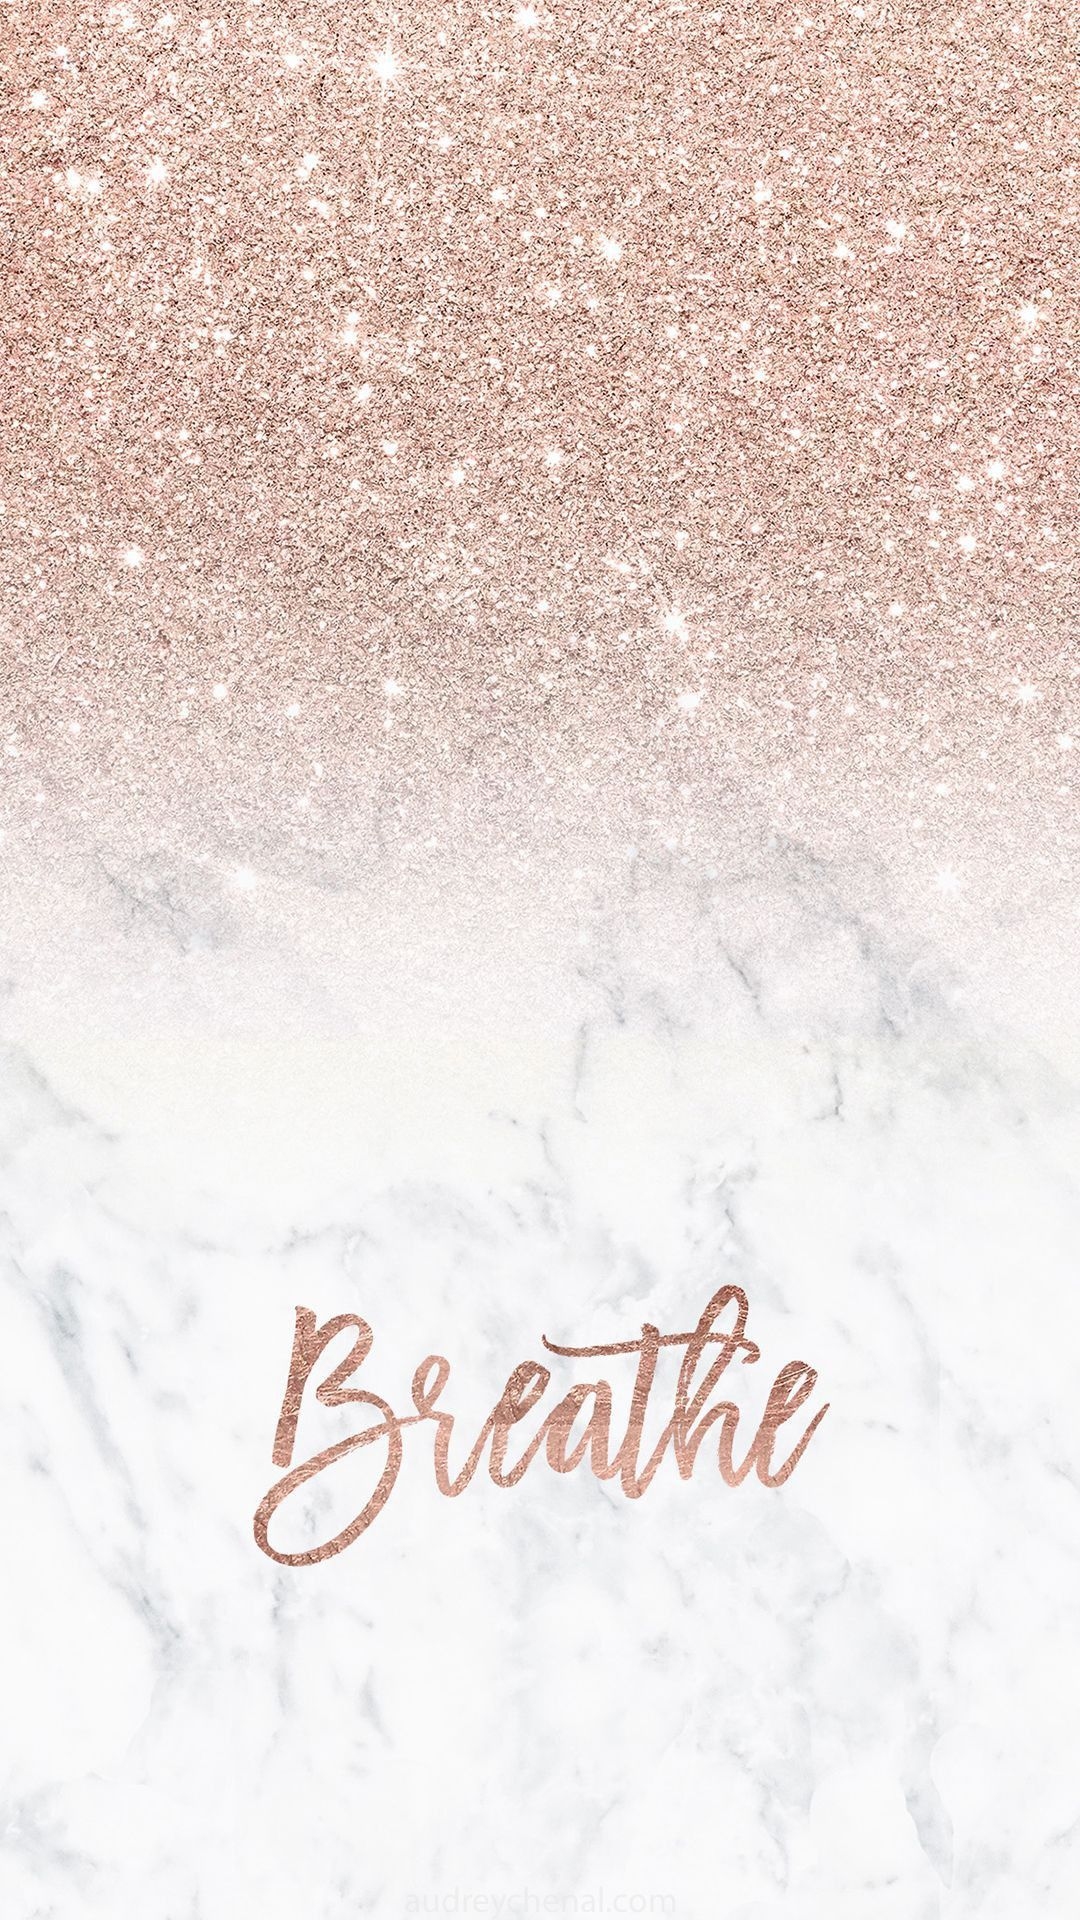 Breathe Wallpaper Wallpaperideas Rose Gold Wallpaper Iphone Gold Wallpaper Iphone Rose Gold Wallpaper